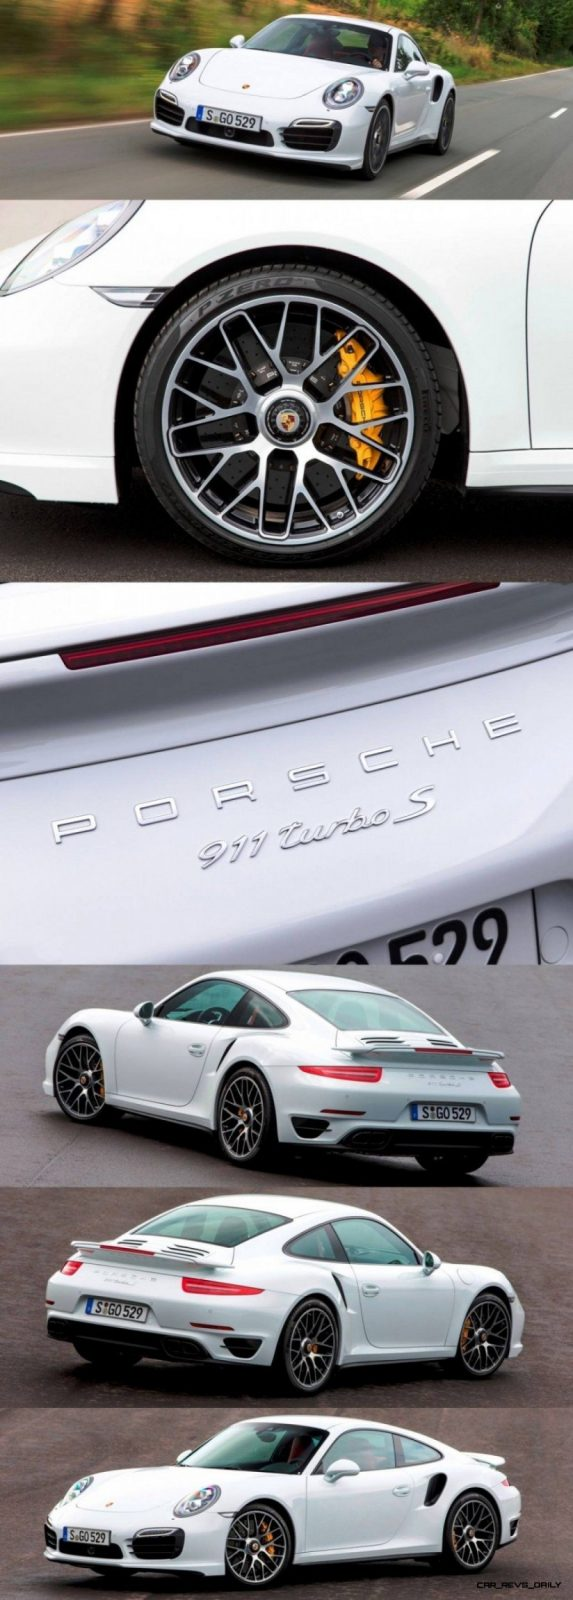 Porsche-911-Turbo-S-_11_-vert-1290x3600